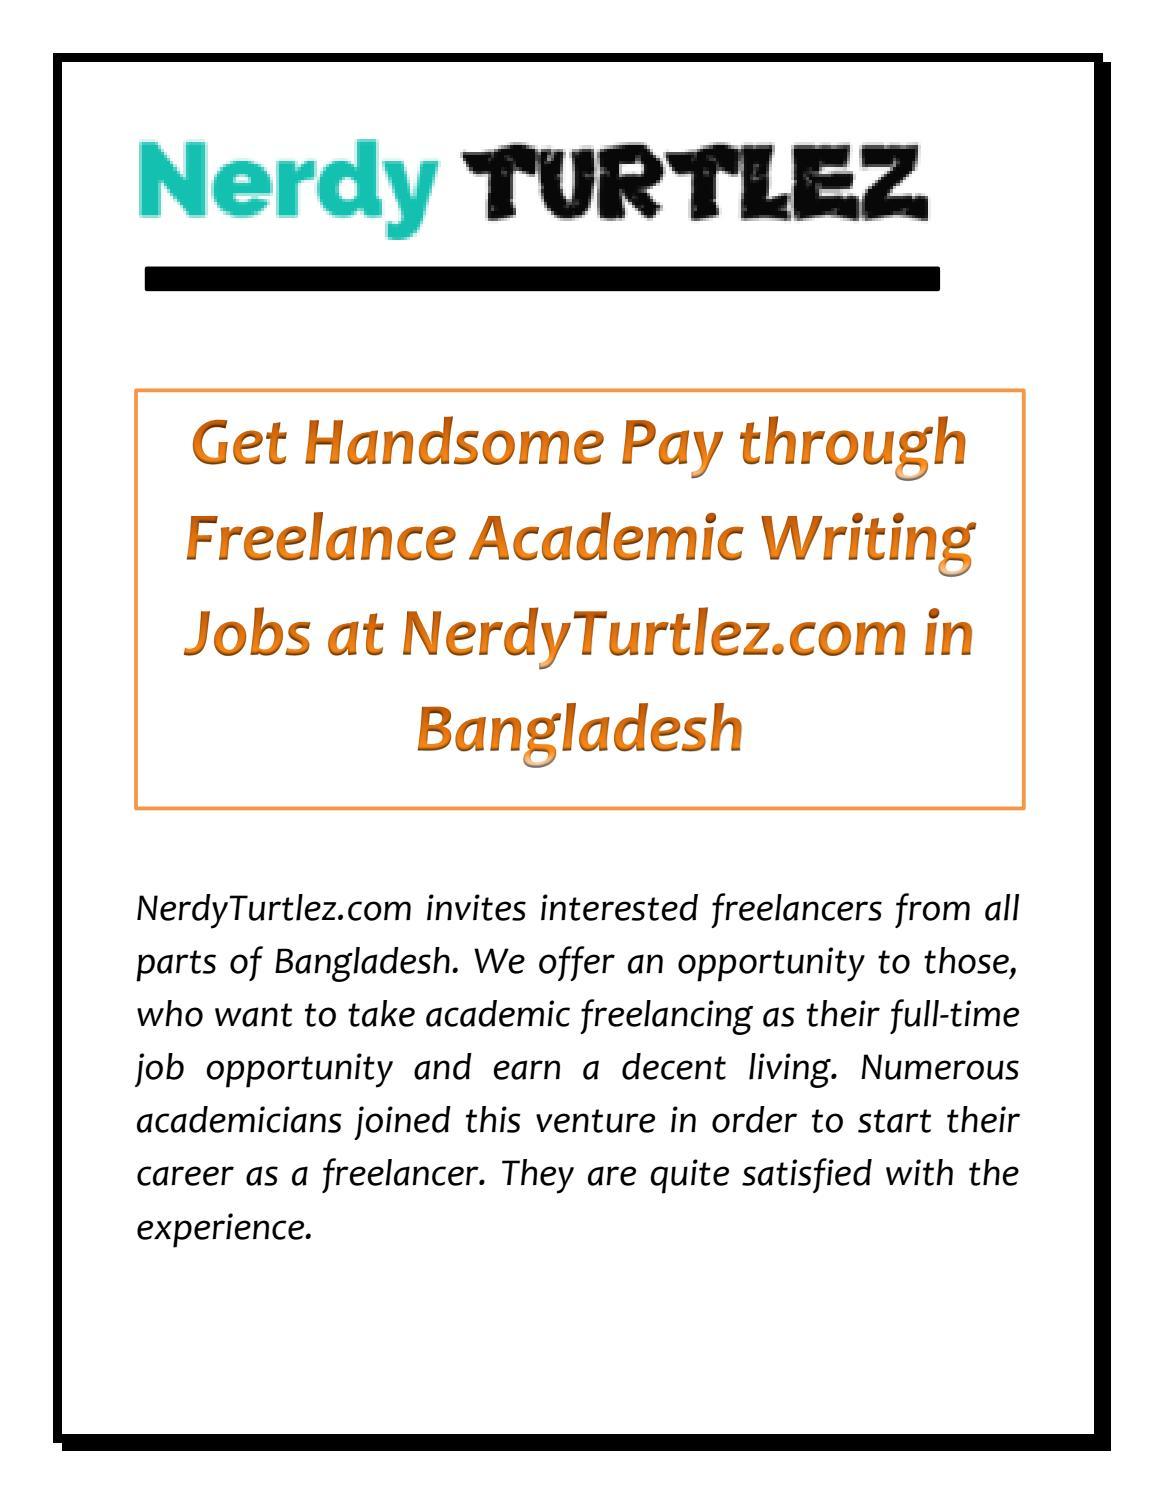 Freelance academic writing companies